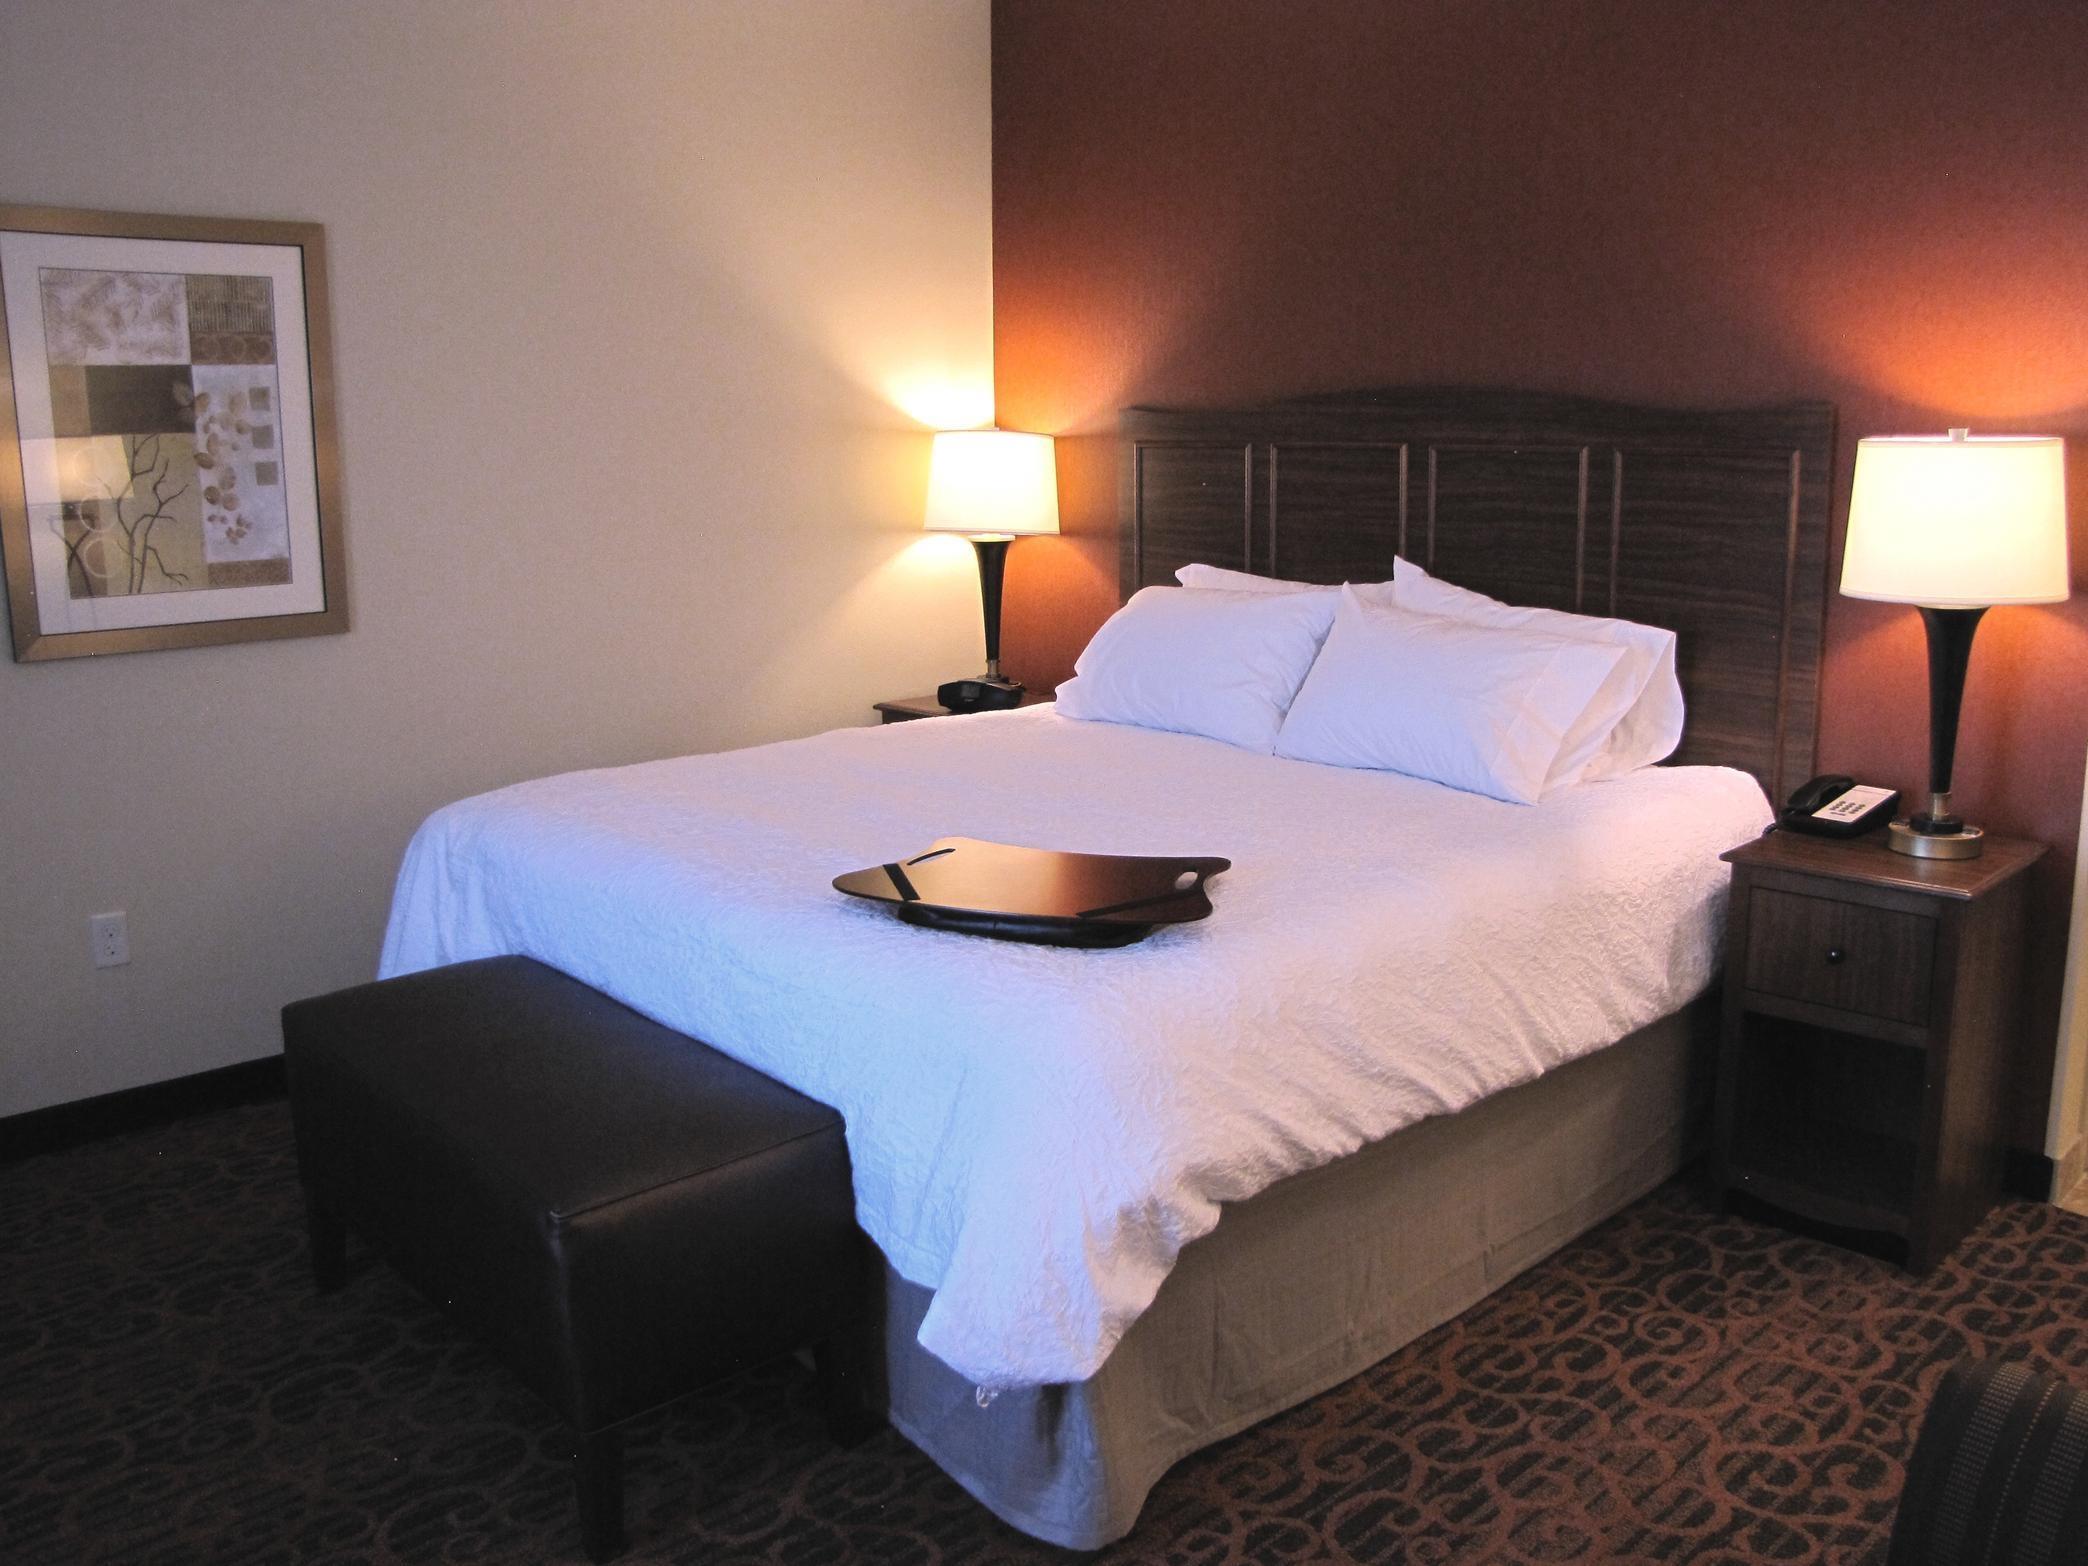 Hampton Inn & Suites Jamestown, ND image 6